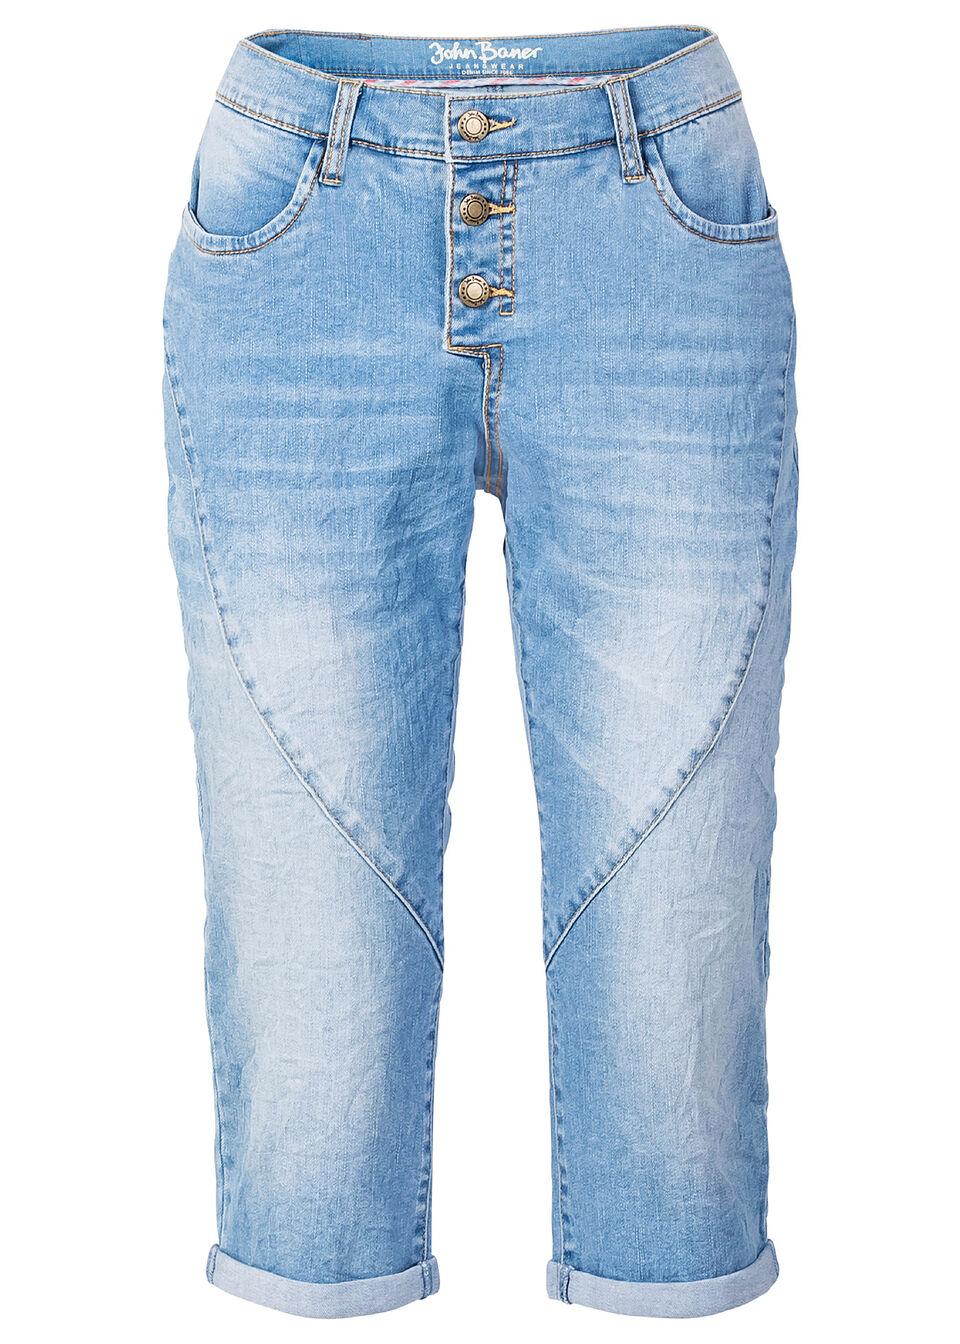 Суперэластичные джинсы-капри в стиле «бойфренд»